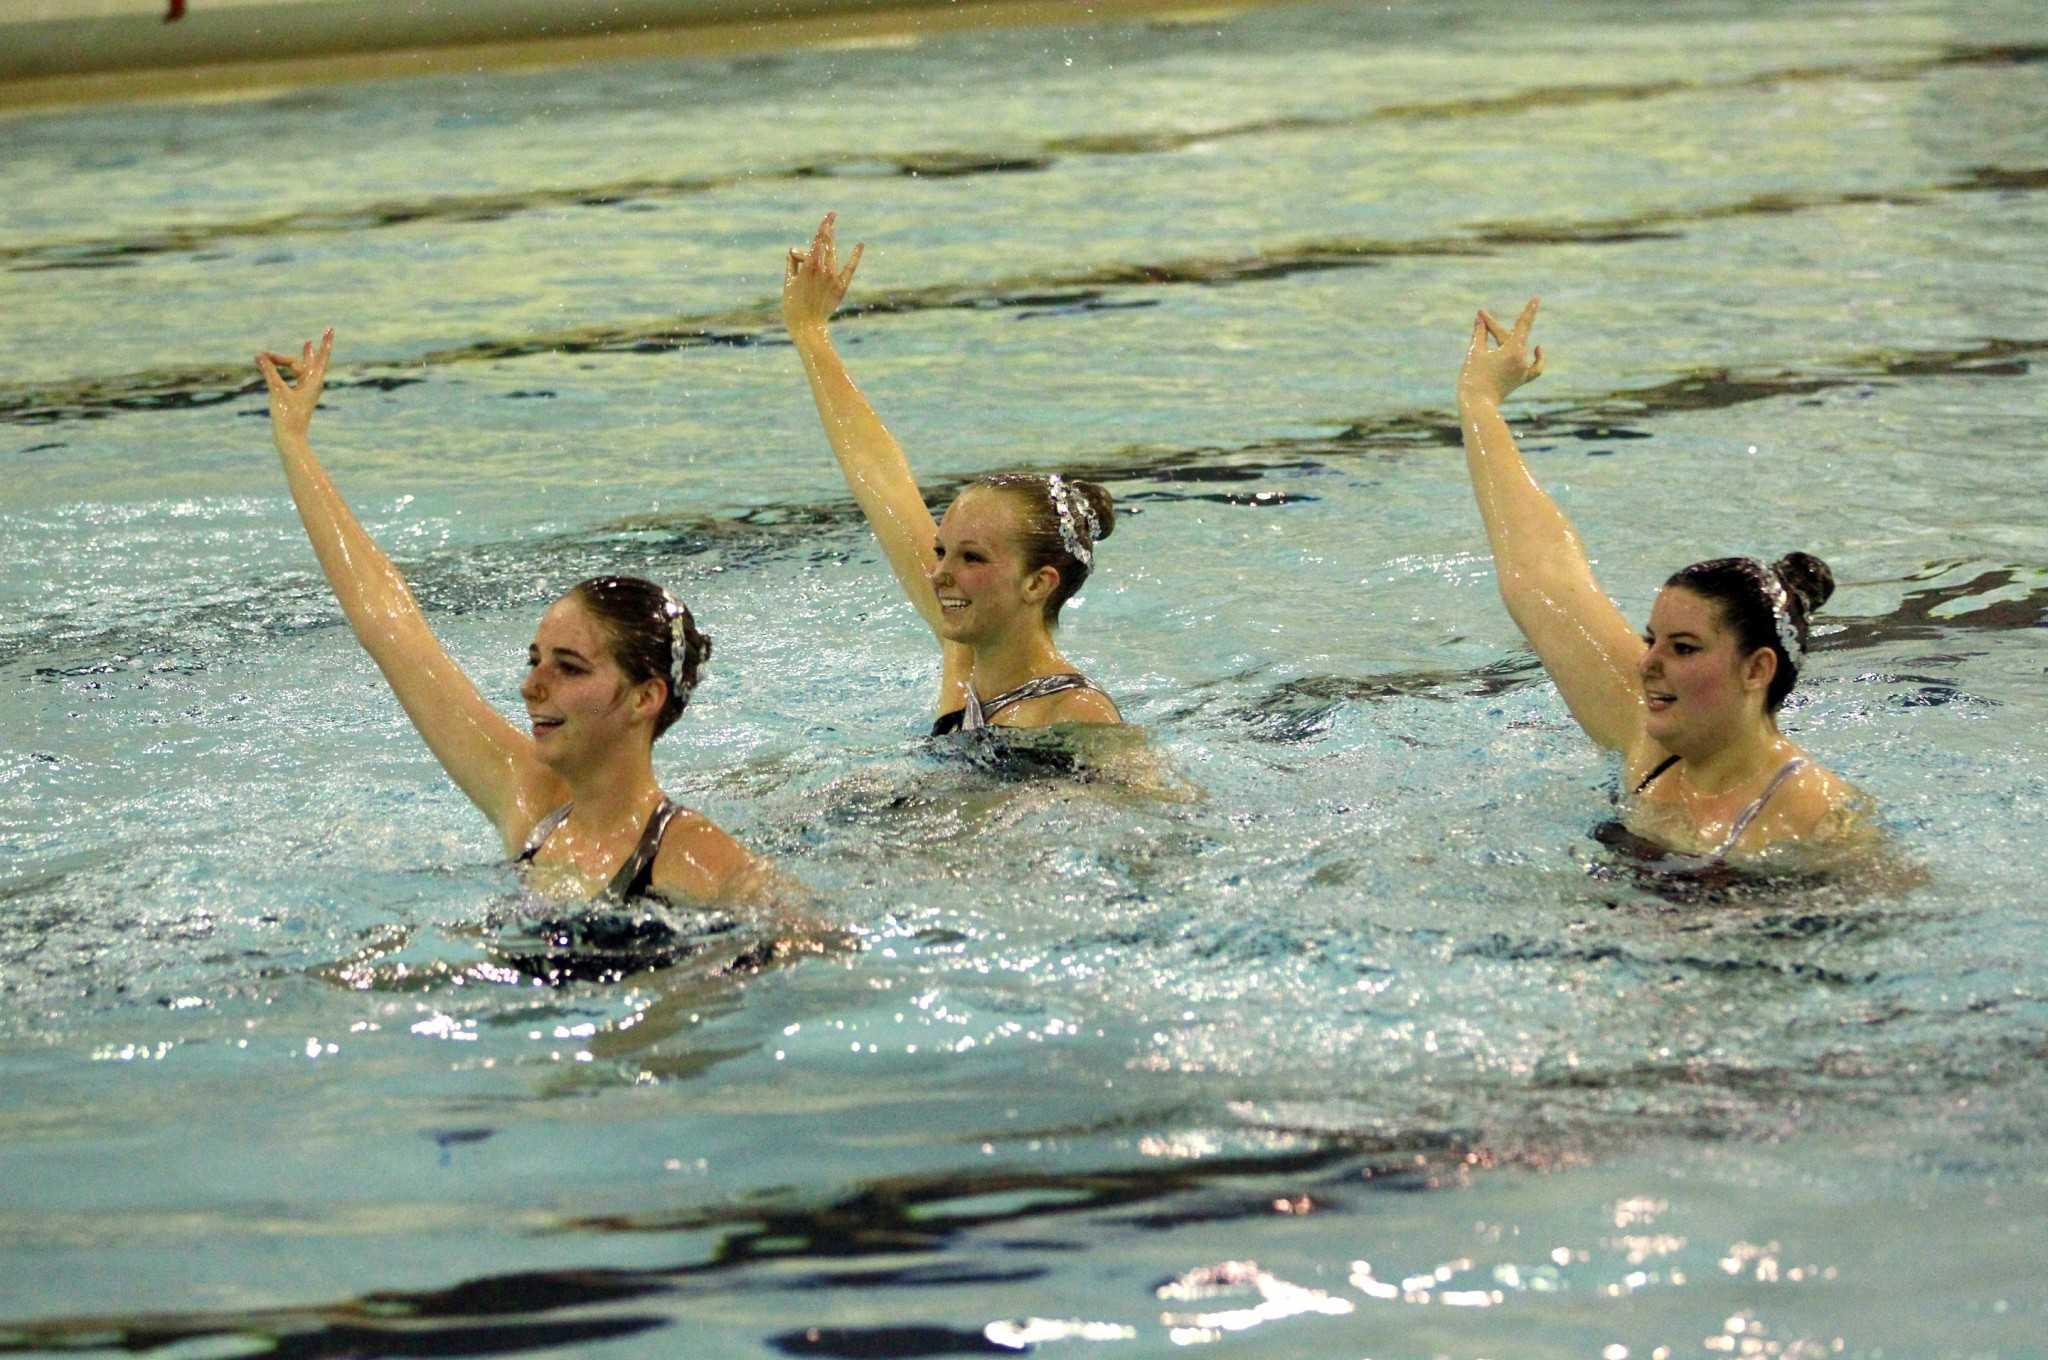 CSU Synchronized swimming team